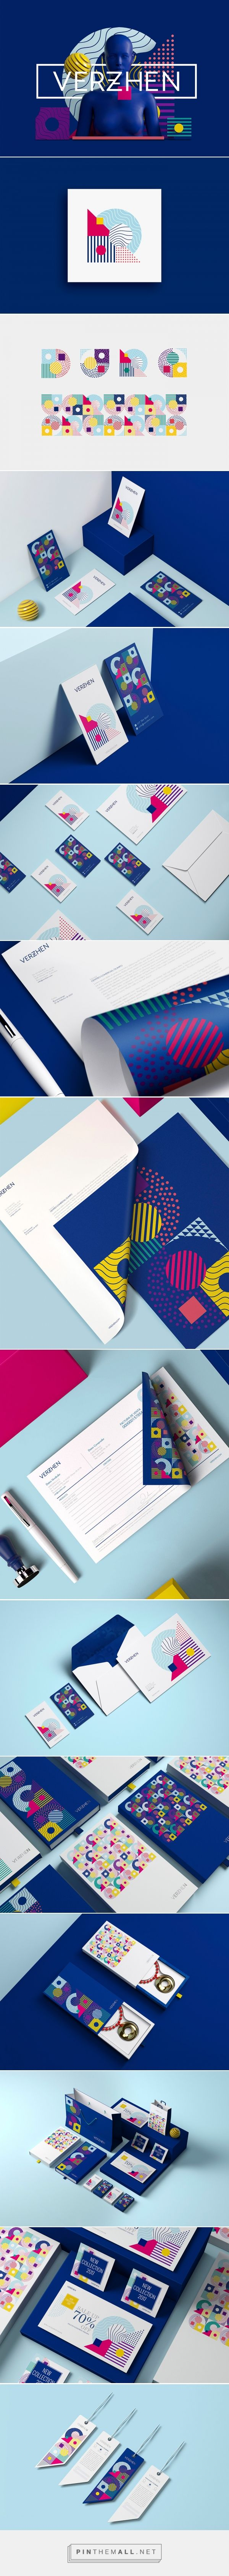 Verzhen Branding by David Espinosa IDS